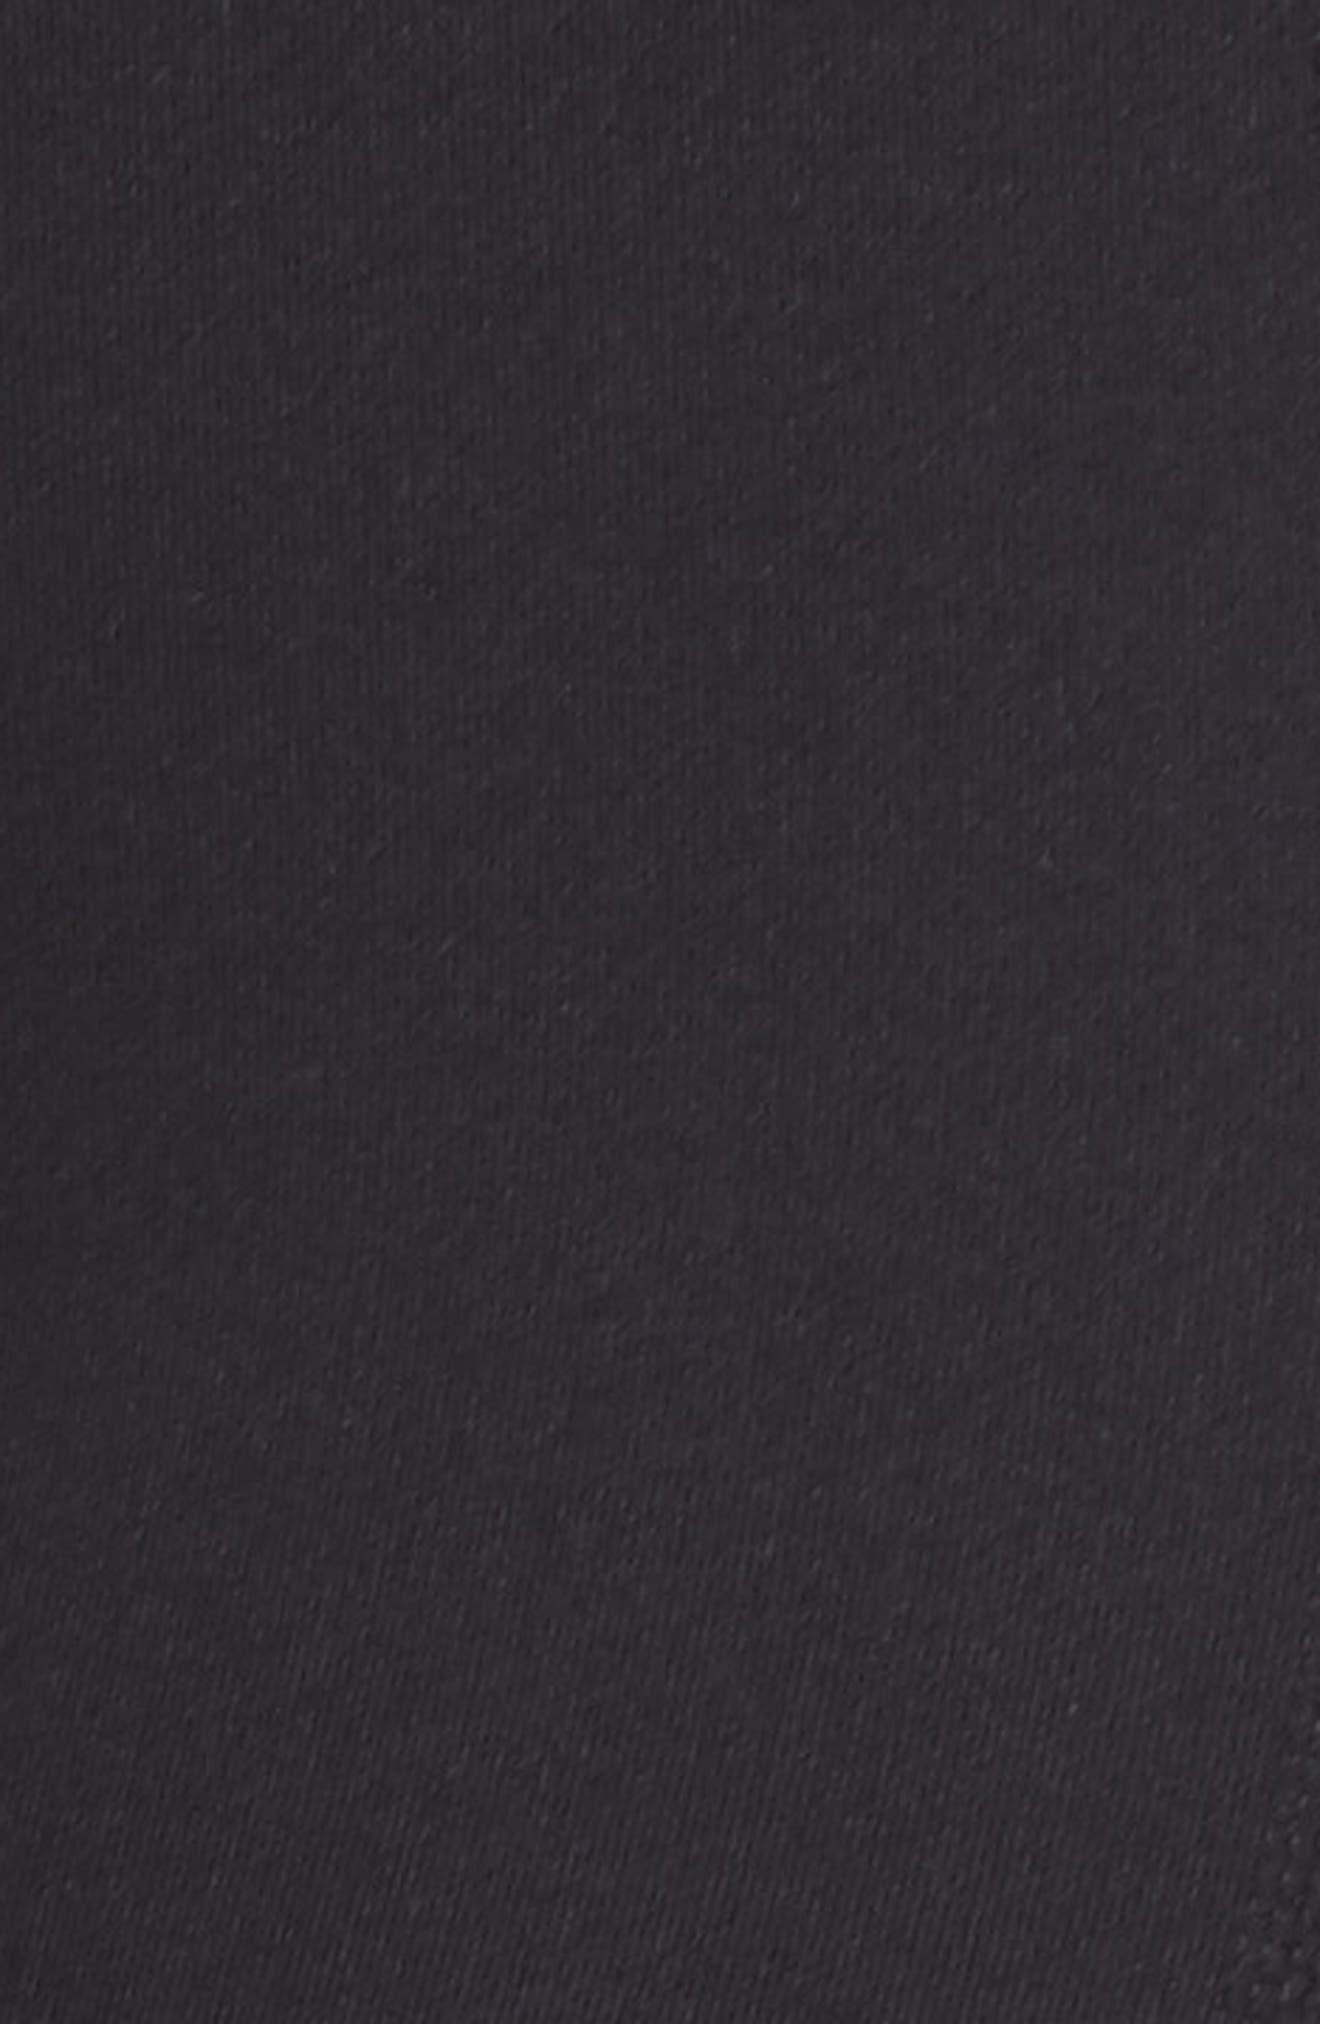 Rise & Shine High Waist Leggings,                             Alternate thumbnail 6, color,                             Black